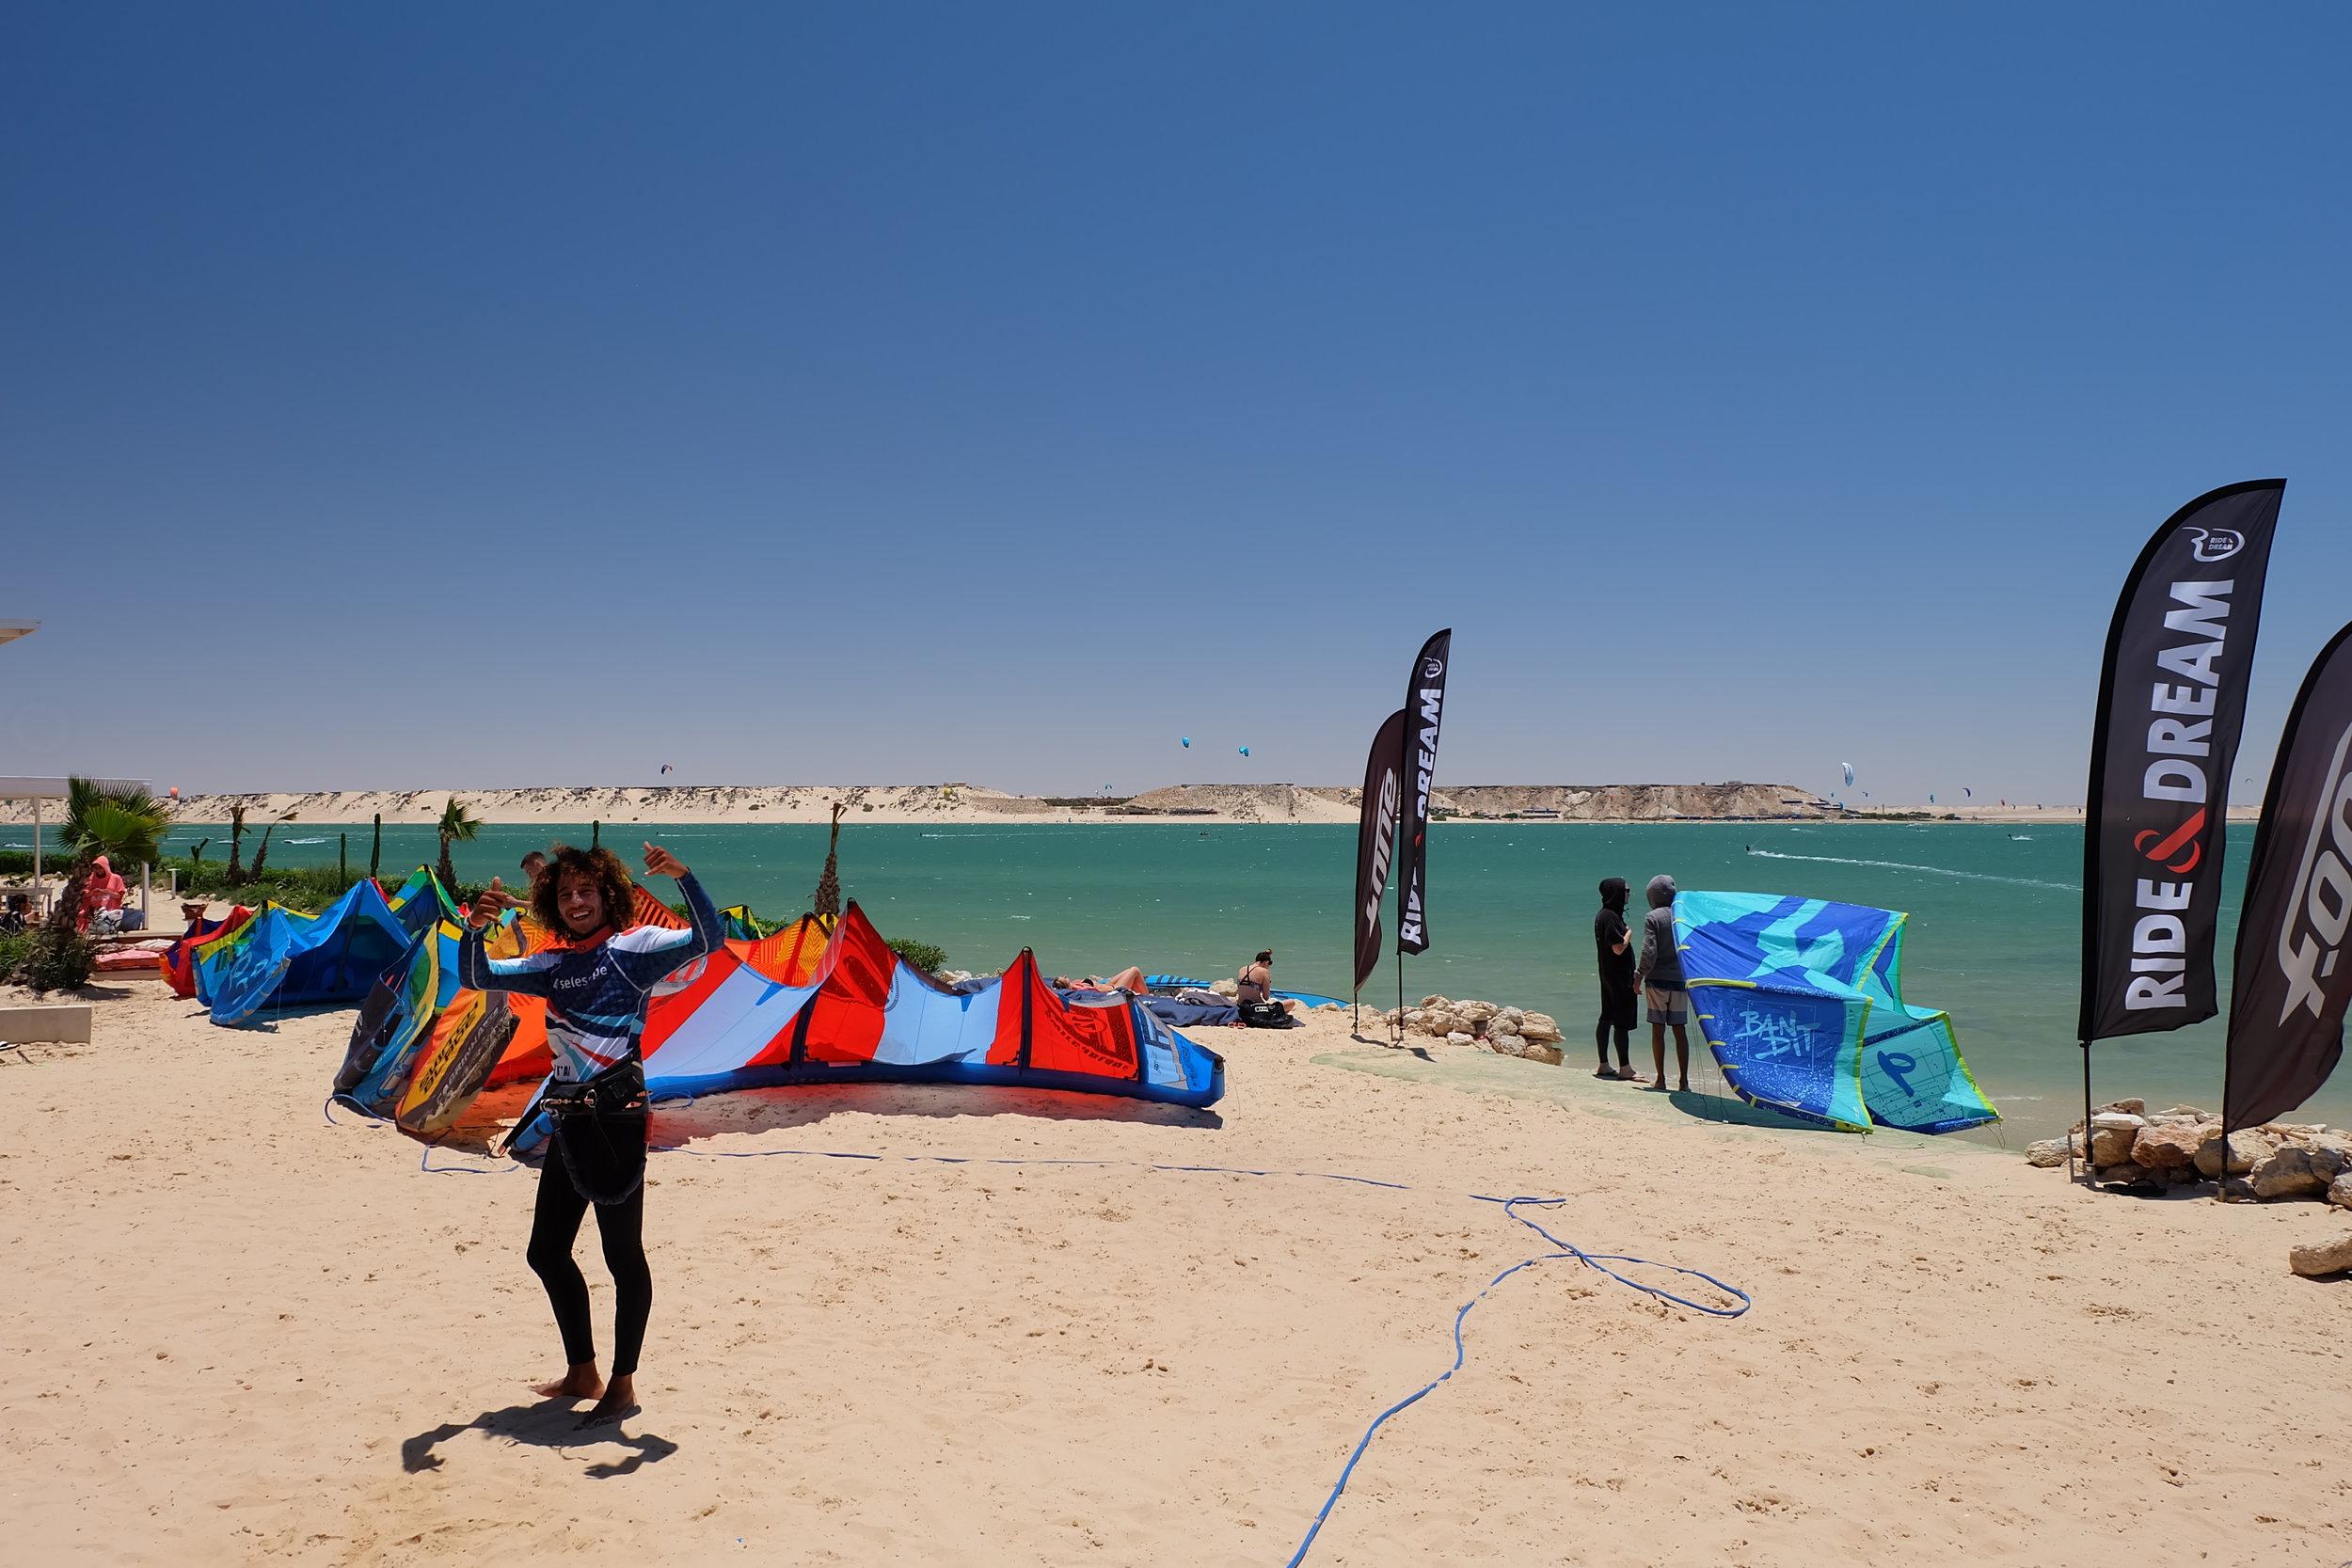 Dakhla kitesurf trip 2019 - Kite Control Portugal.JPG